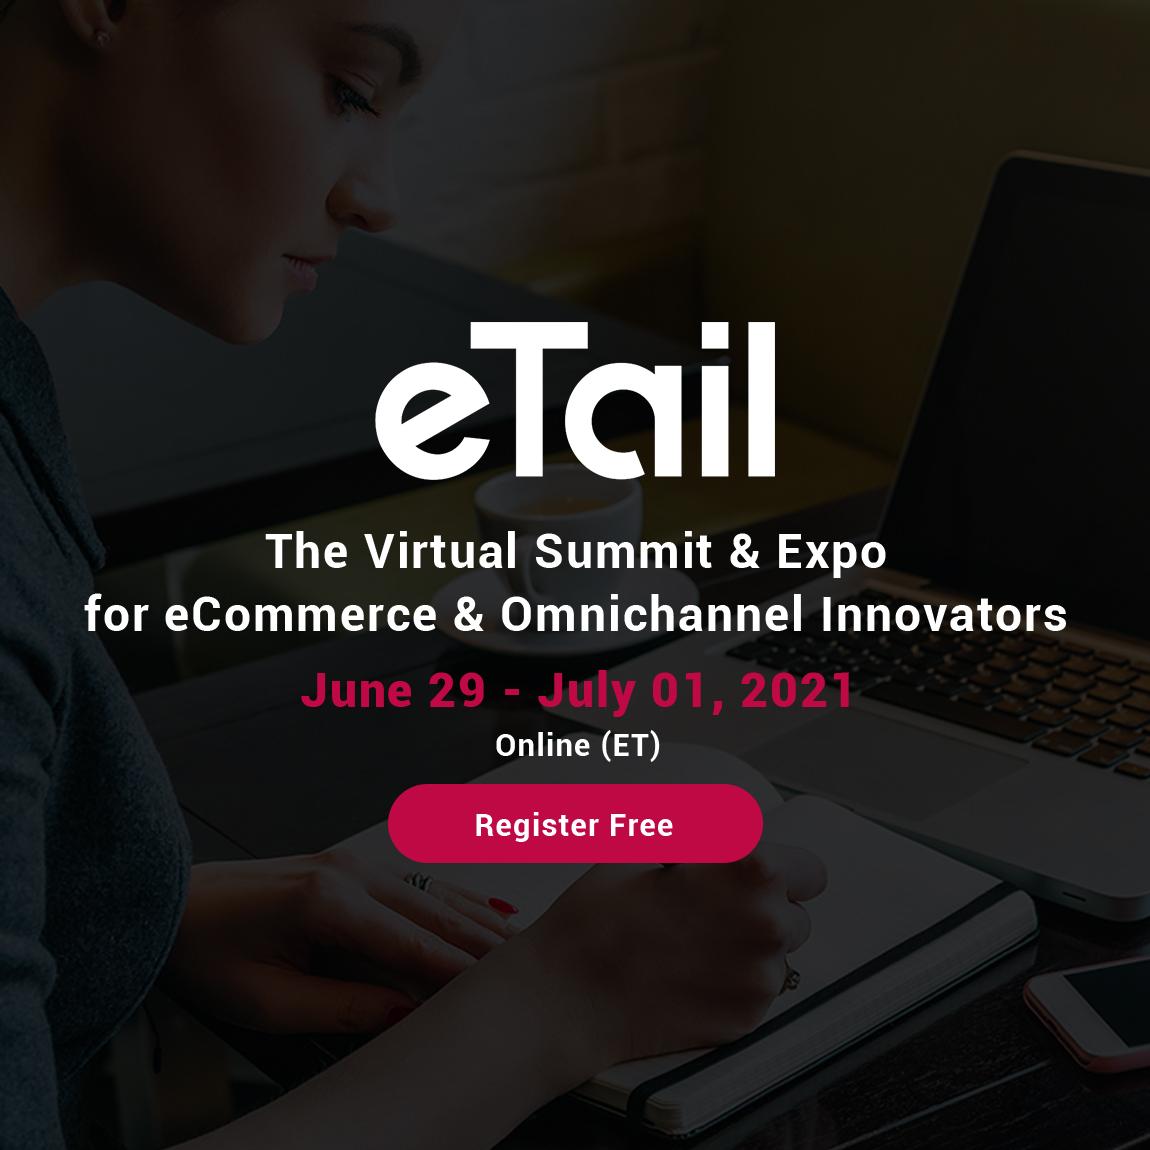 eTail Virtual Summit